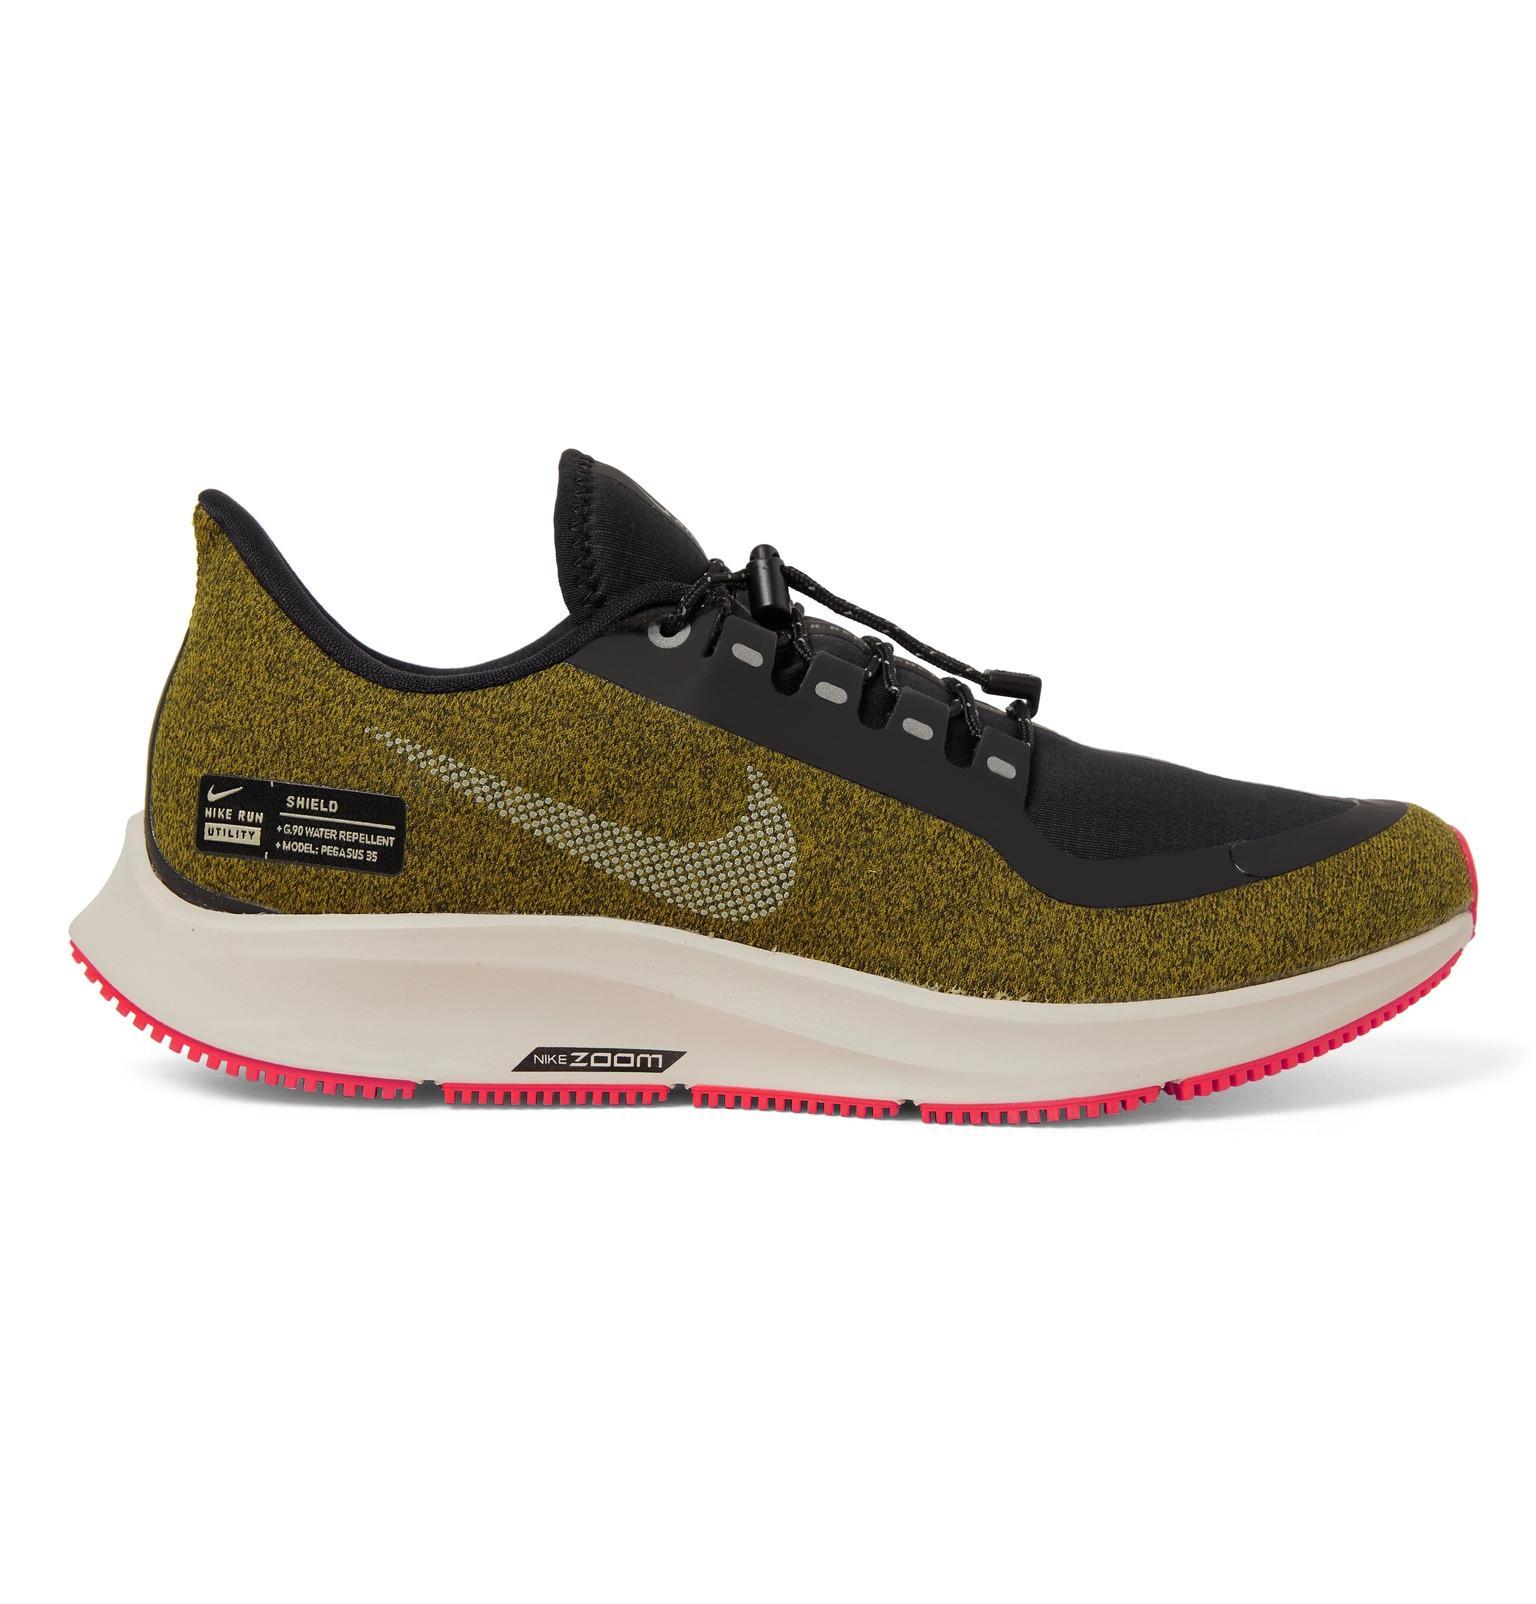 a573474c64e13 Lyst - Nike Air Zoom Pegasus 35 Shield Water-repellent Sneakers in ...